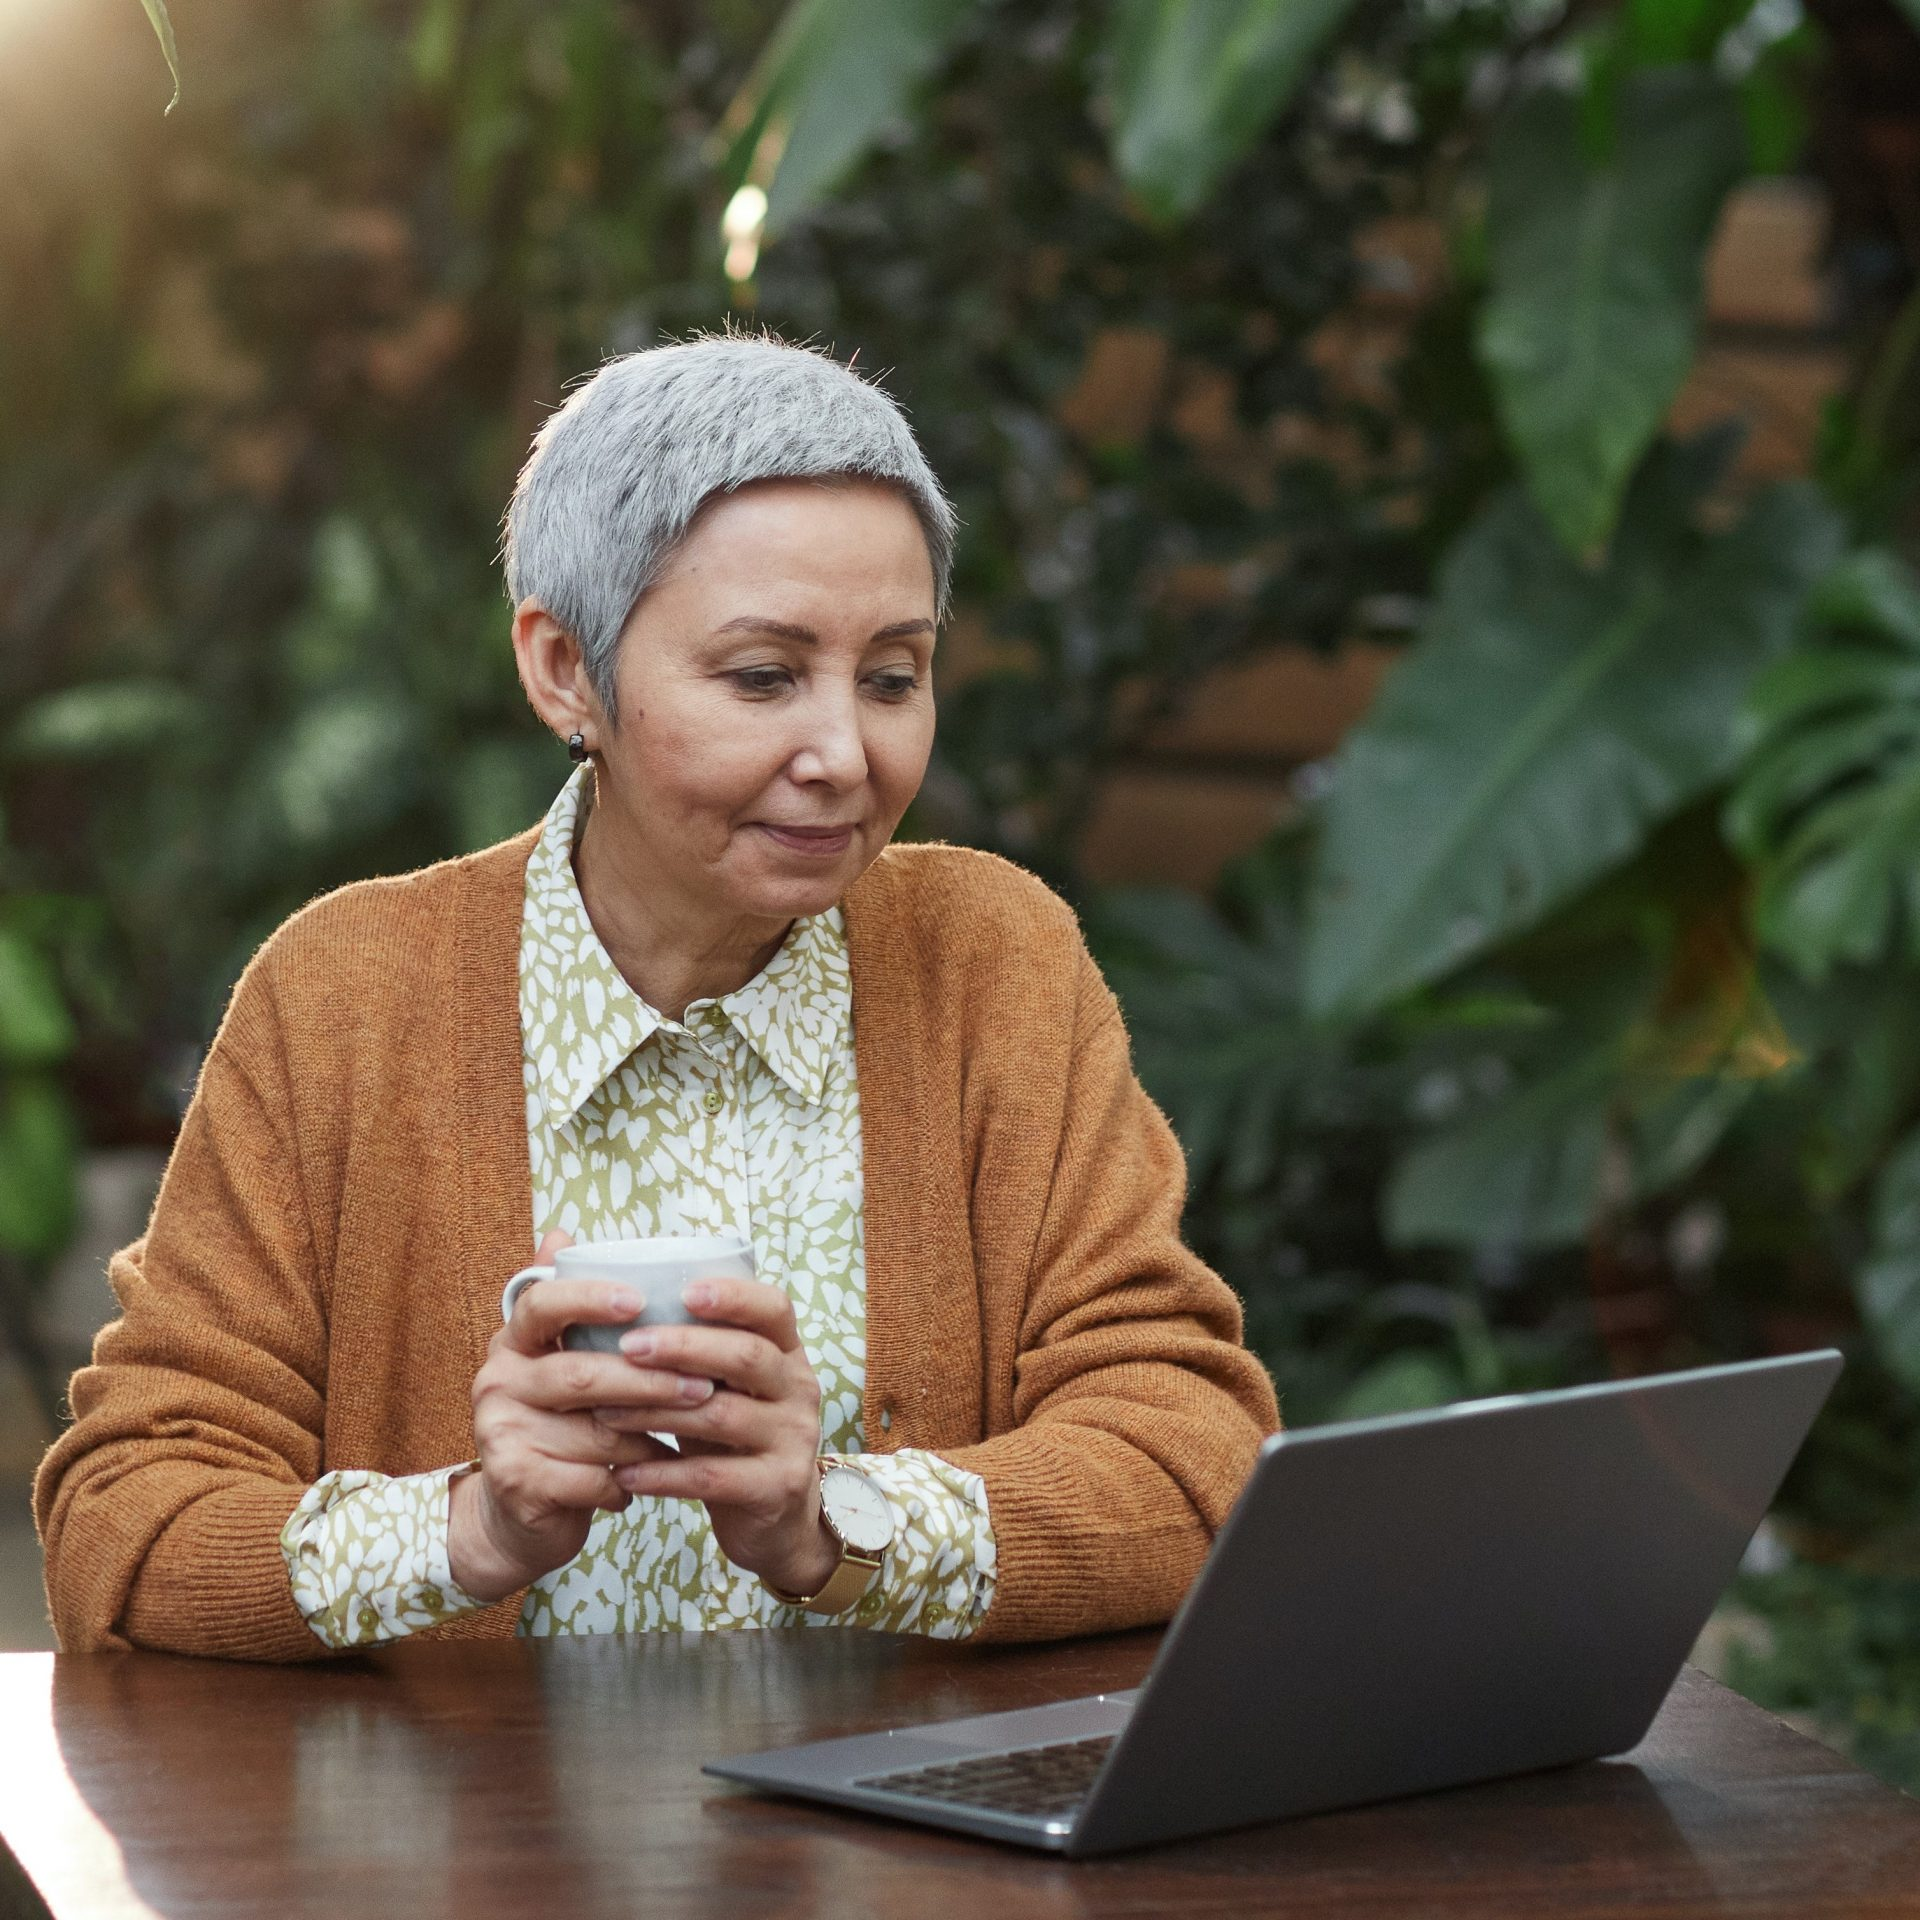 Senior Planet Montgomery Announces New Technology Classes for Seniors